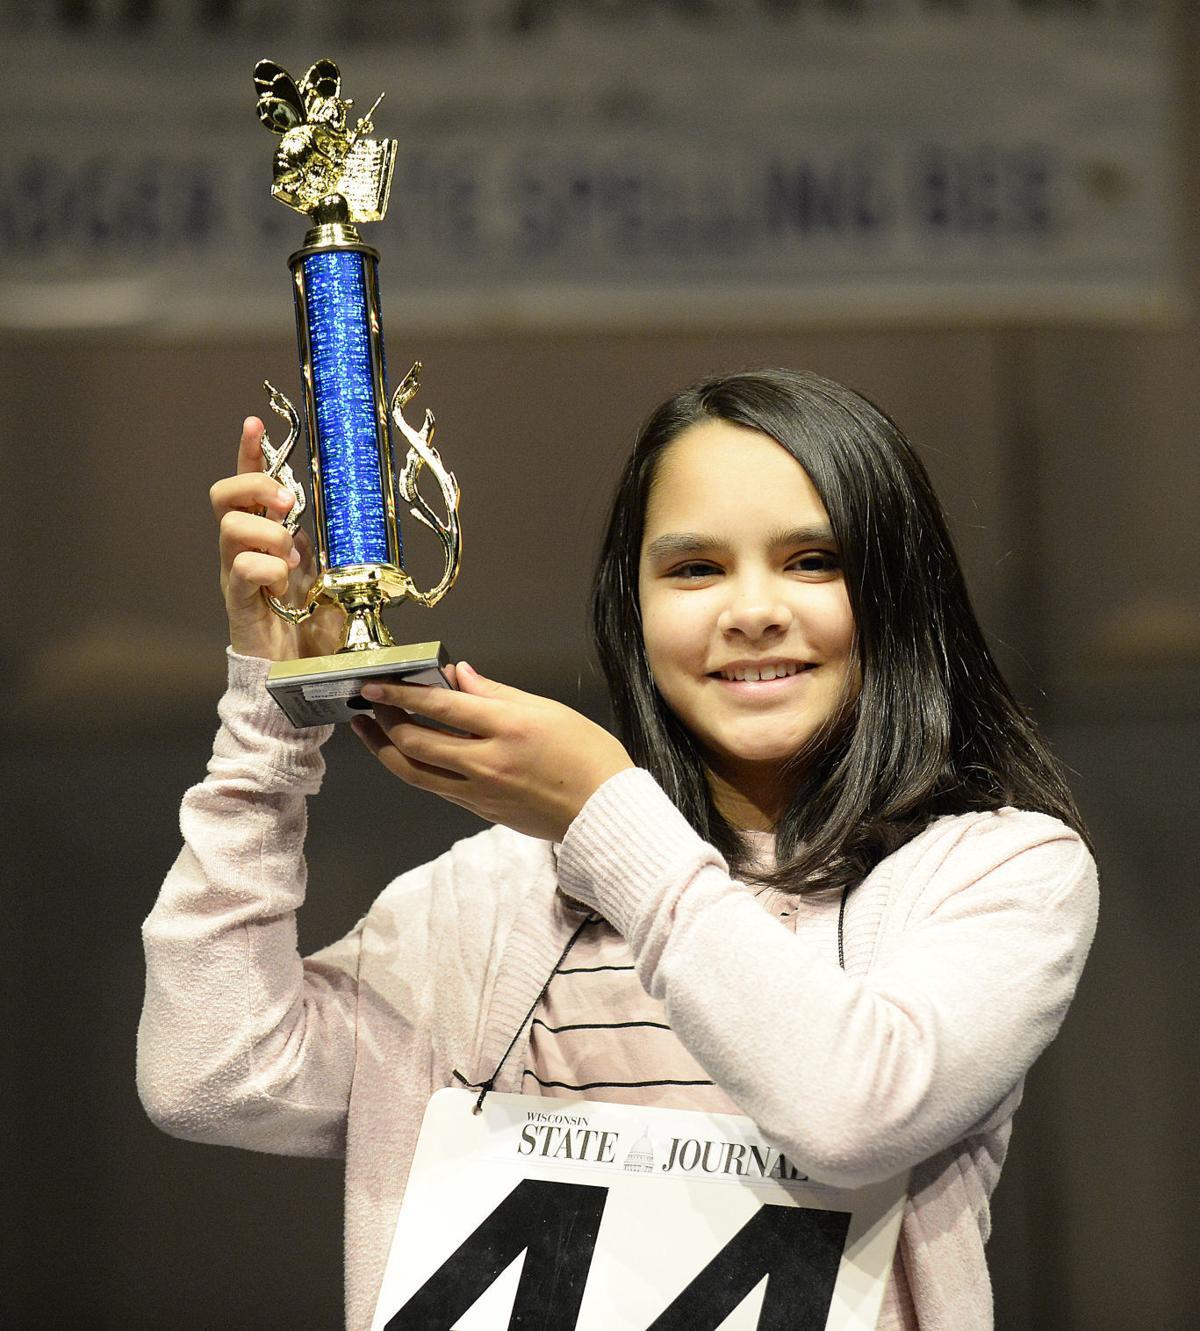 Badger State Spelling Bee champion Maya Jadhav